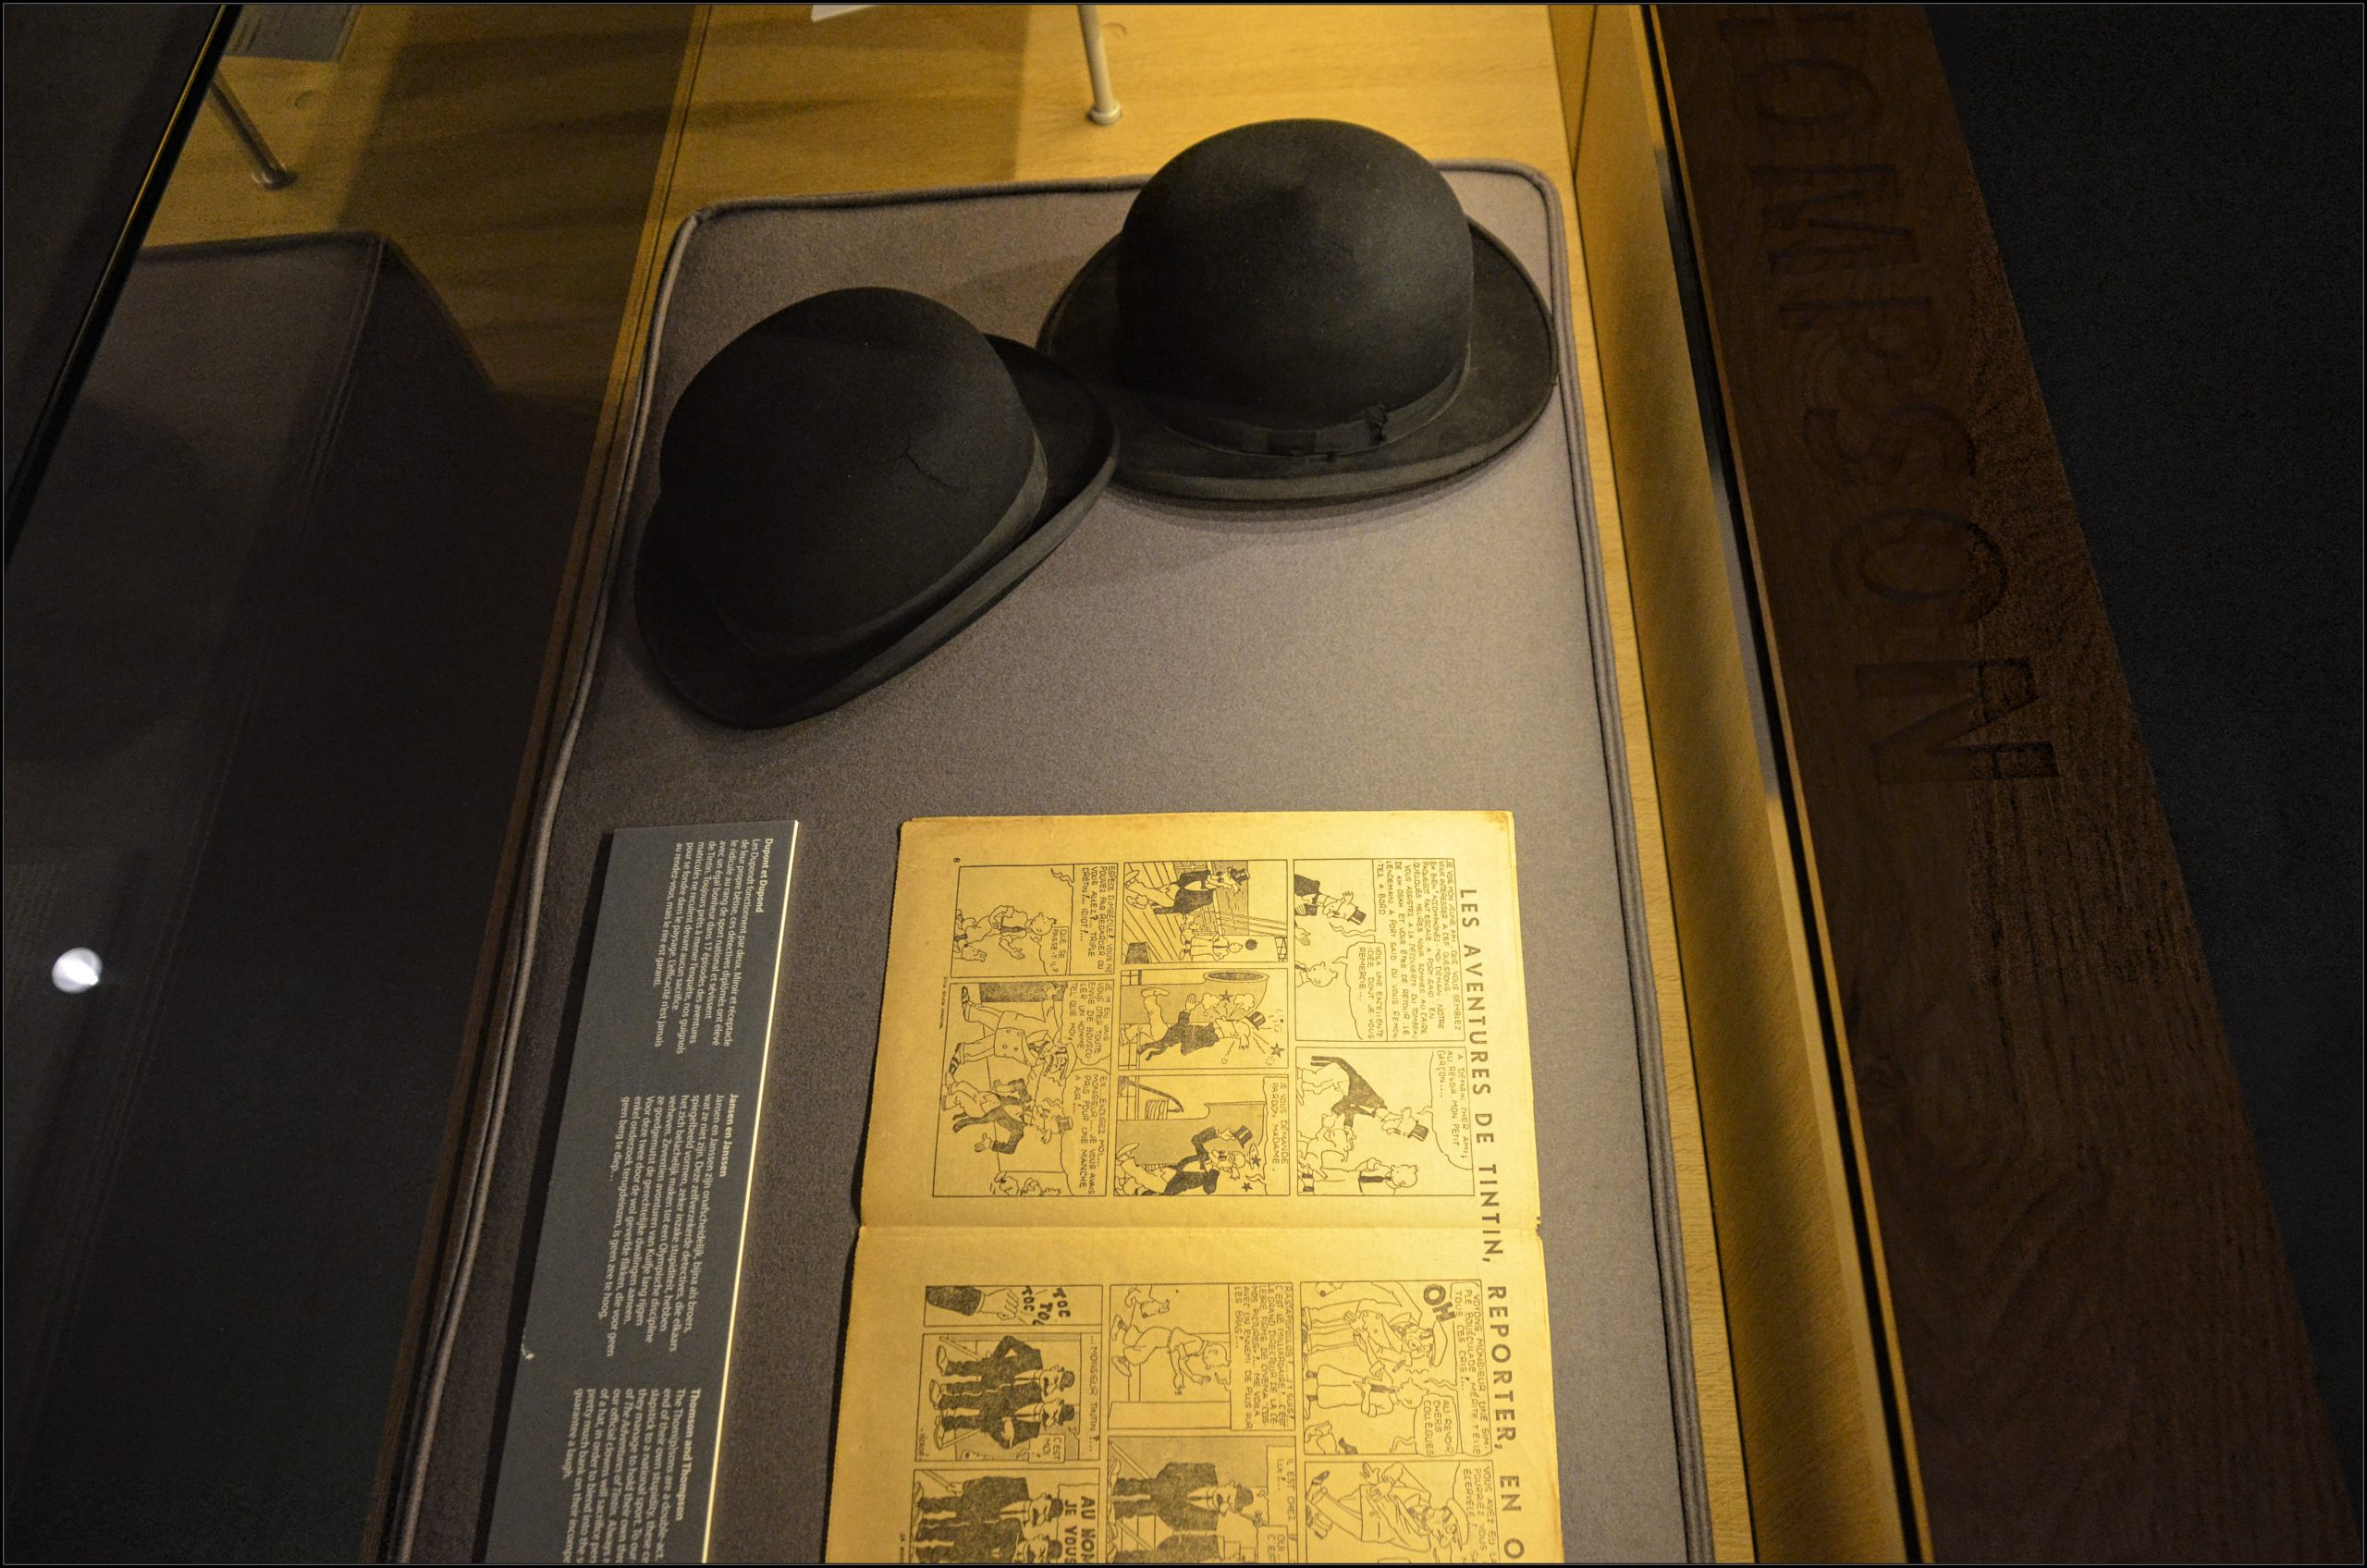 tintin museum brussels